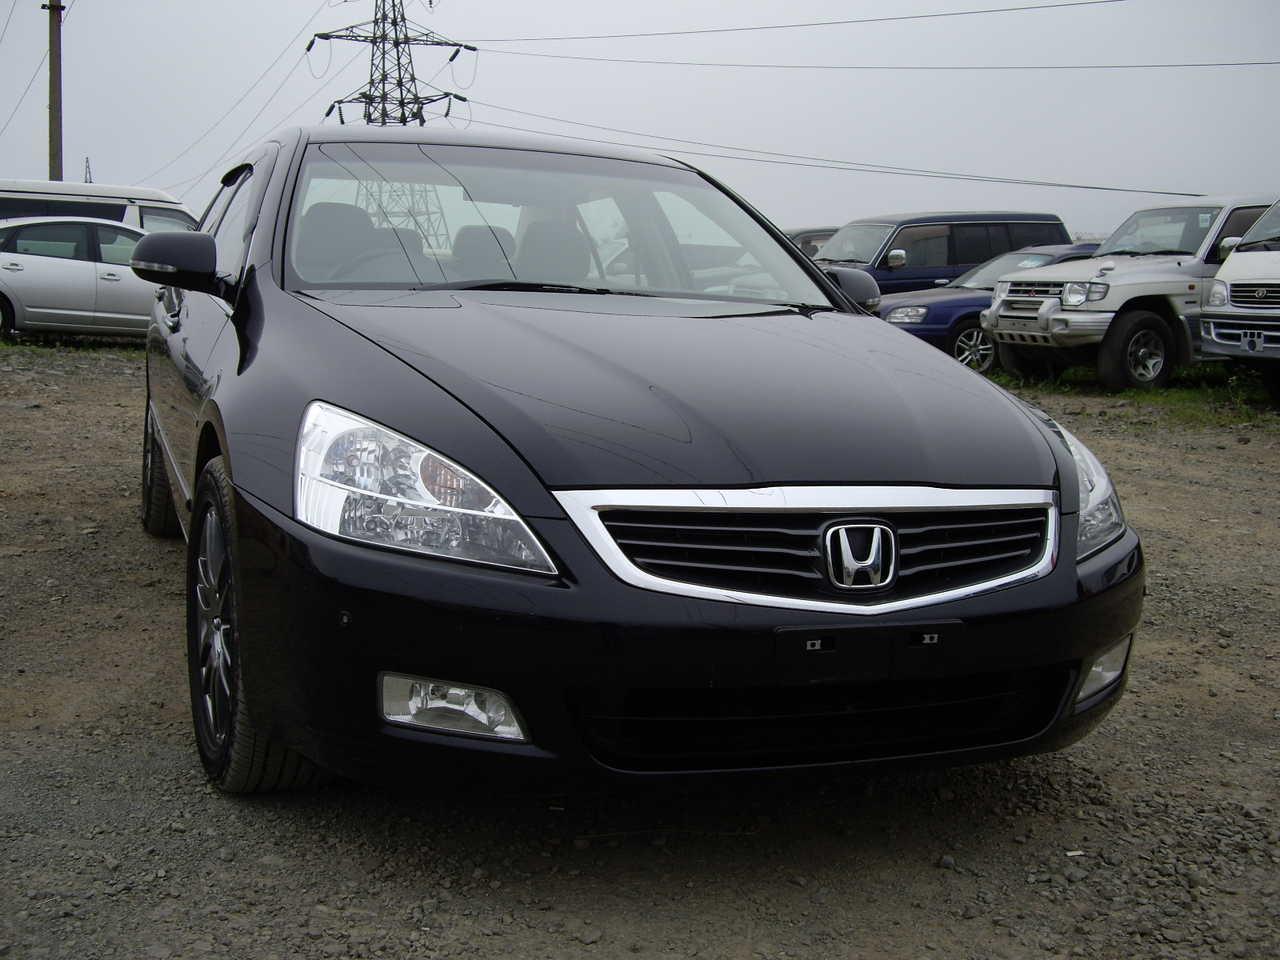 2004 Honda Inspire For Sale, 3000cc., Gasoline, FF, CVT For Sale